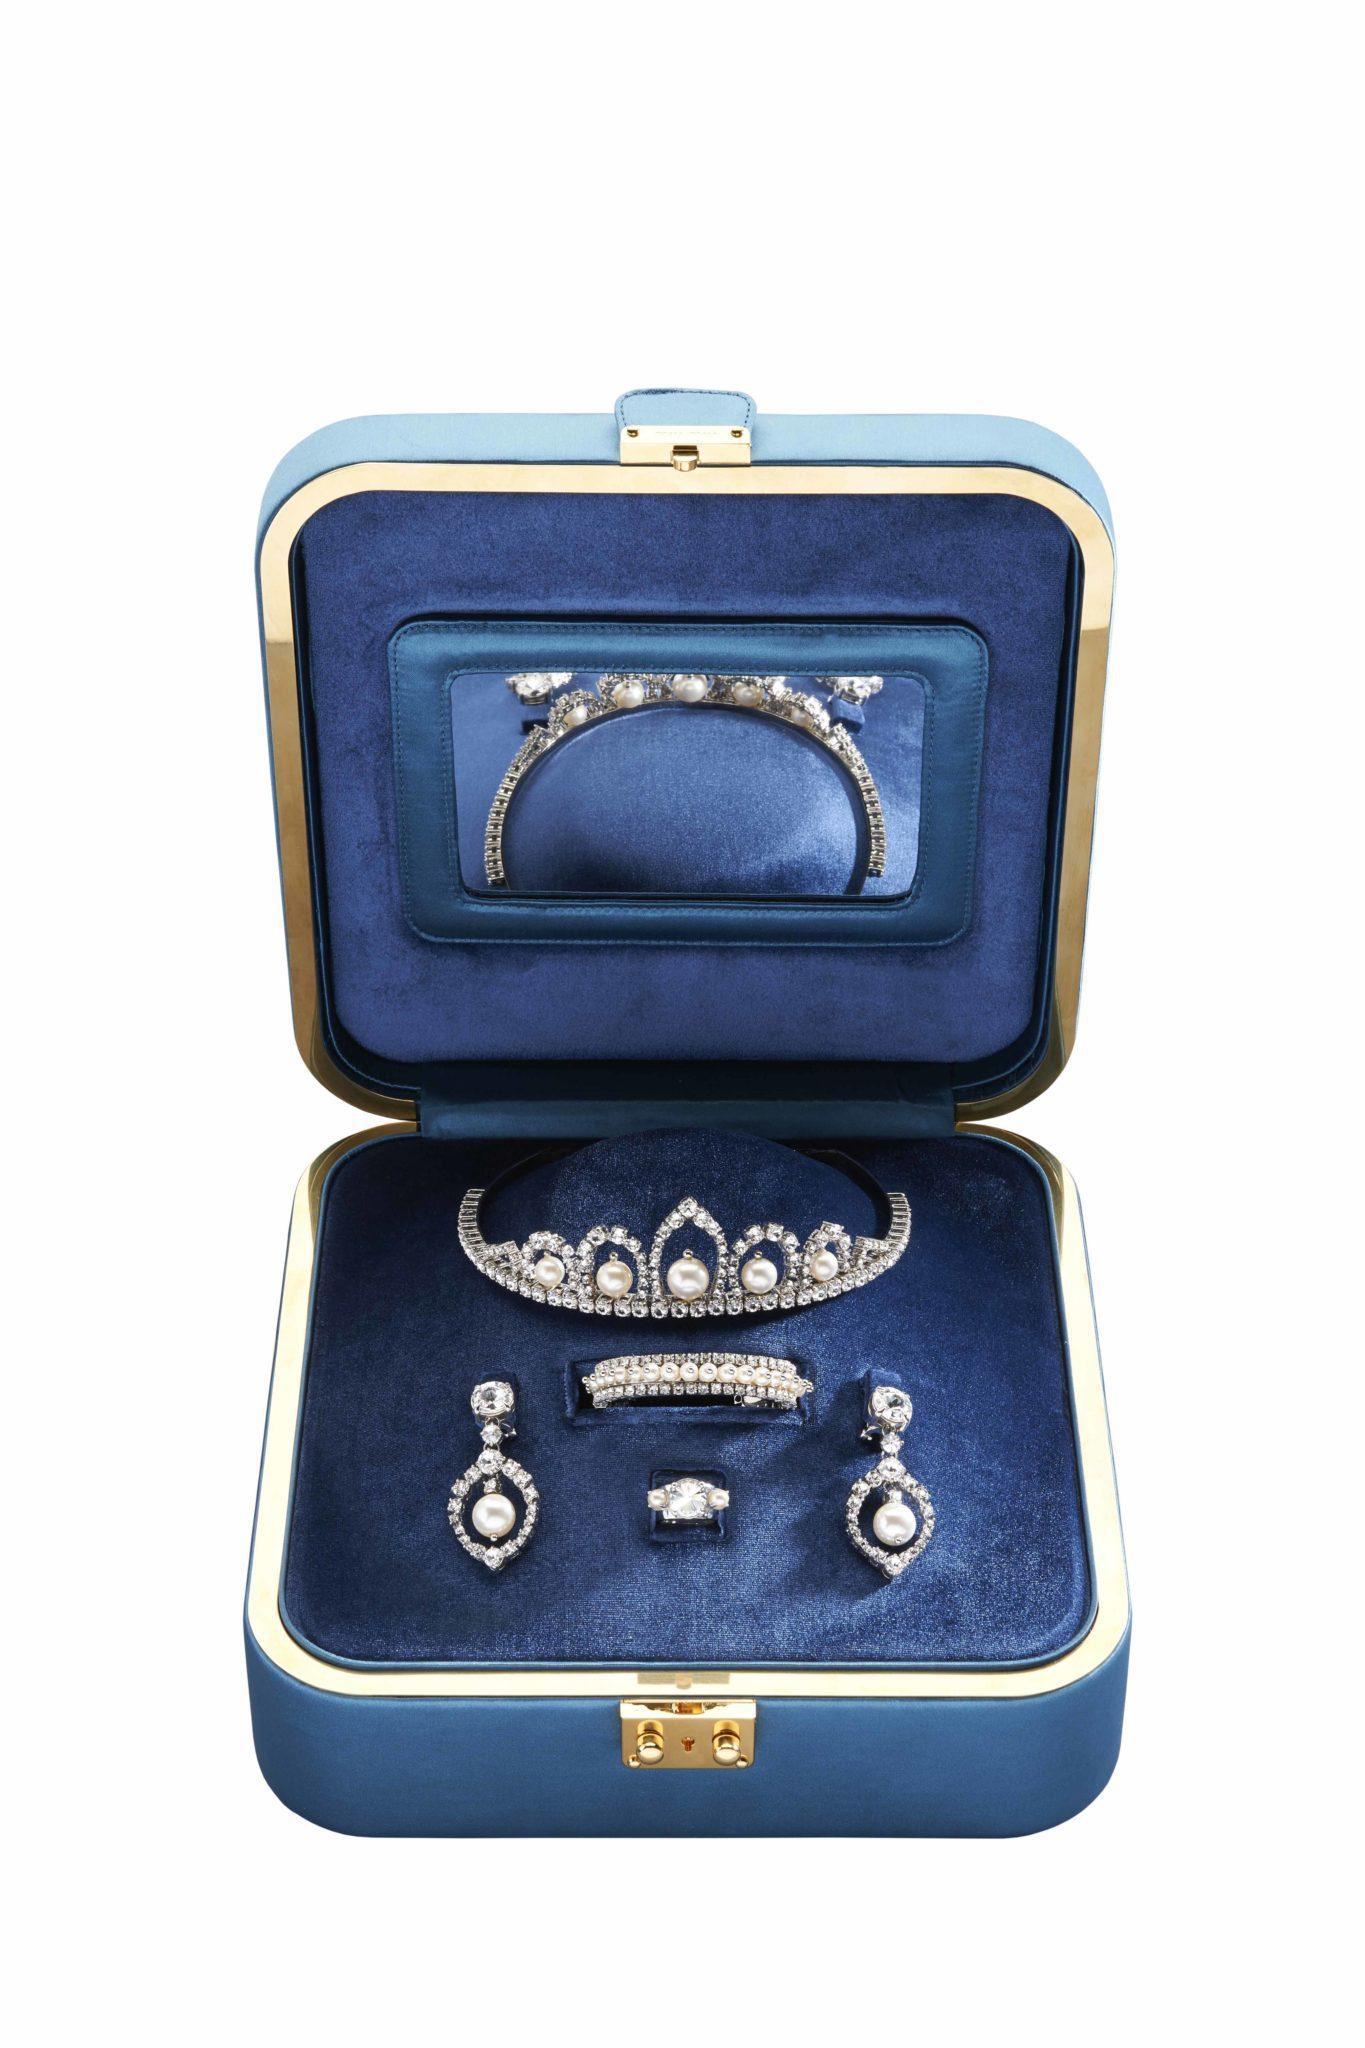 Opulenza Design S Jewelry